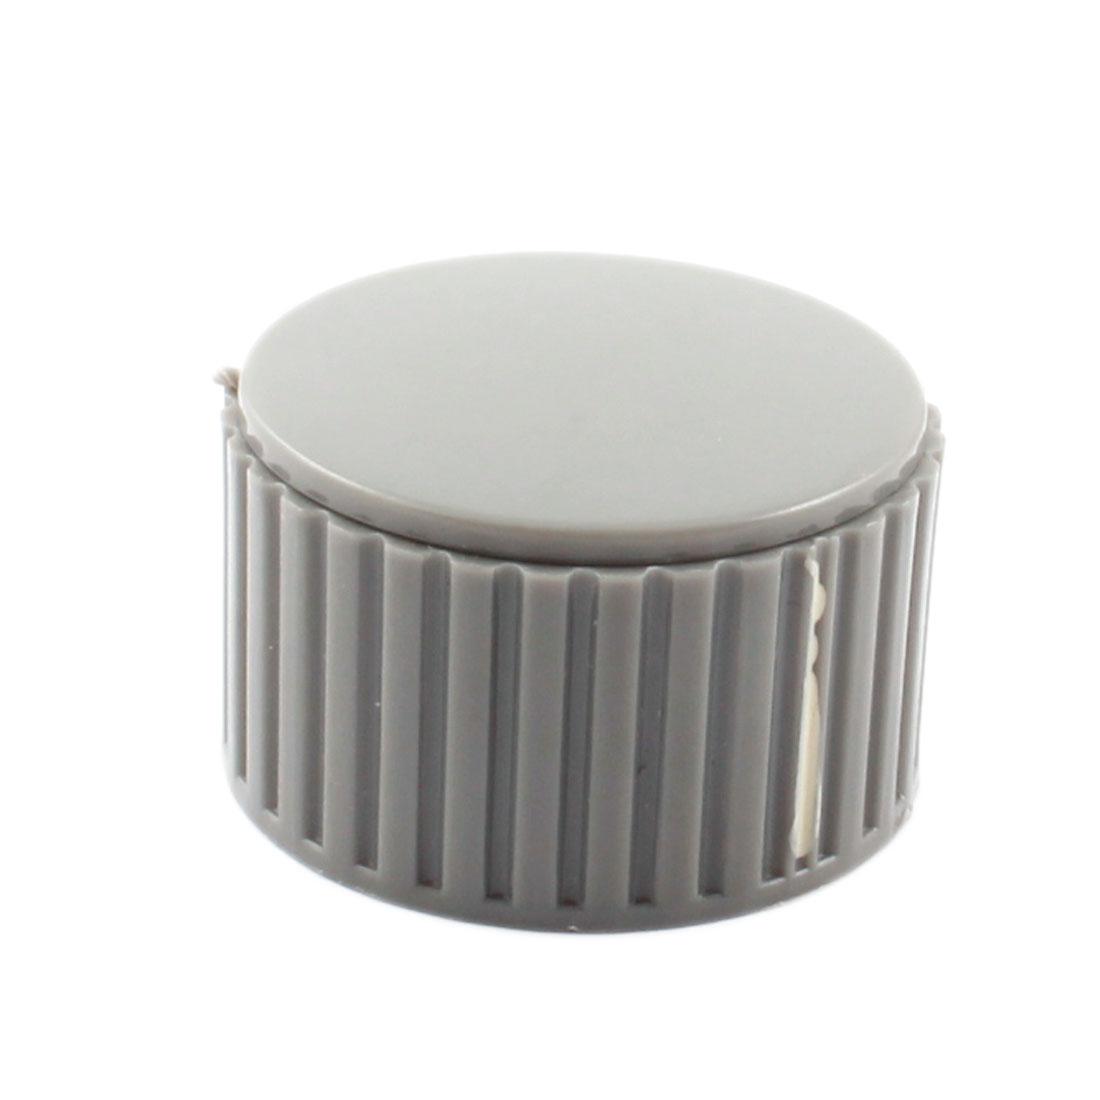 32mm Cap 6mm Dia Insert Hole Nonslip Plastic Volume Control Rotary Potentiometer Knob Gray